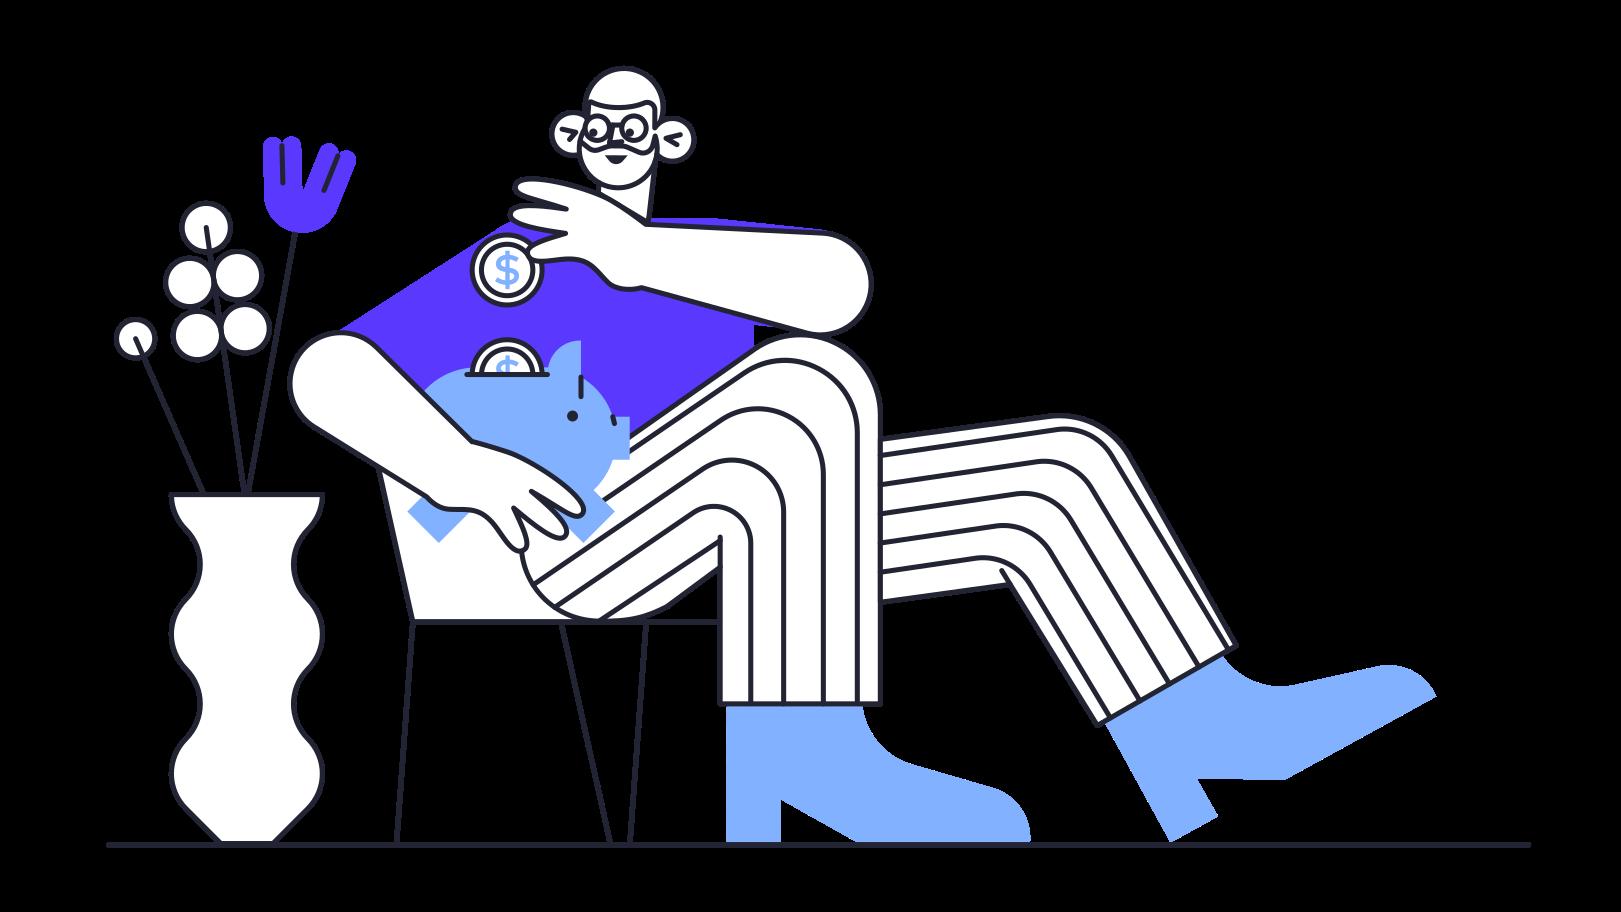 Pagamento processado Clipart illustration in PNG, SVG